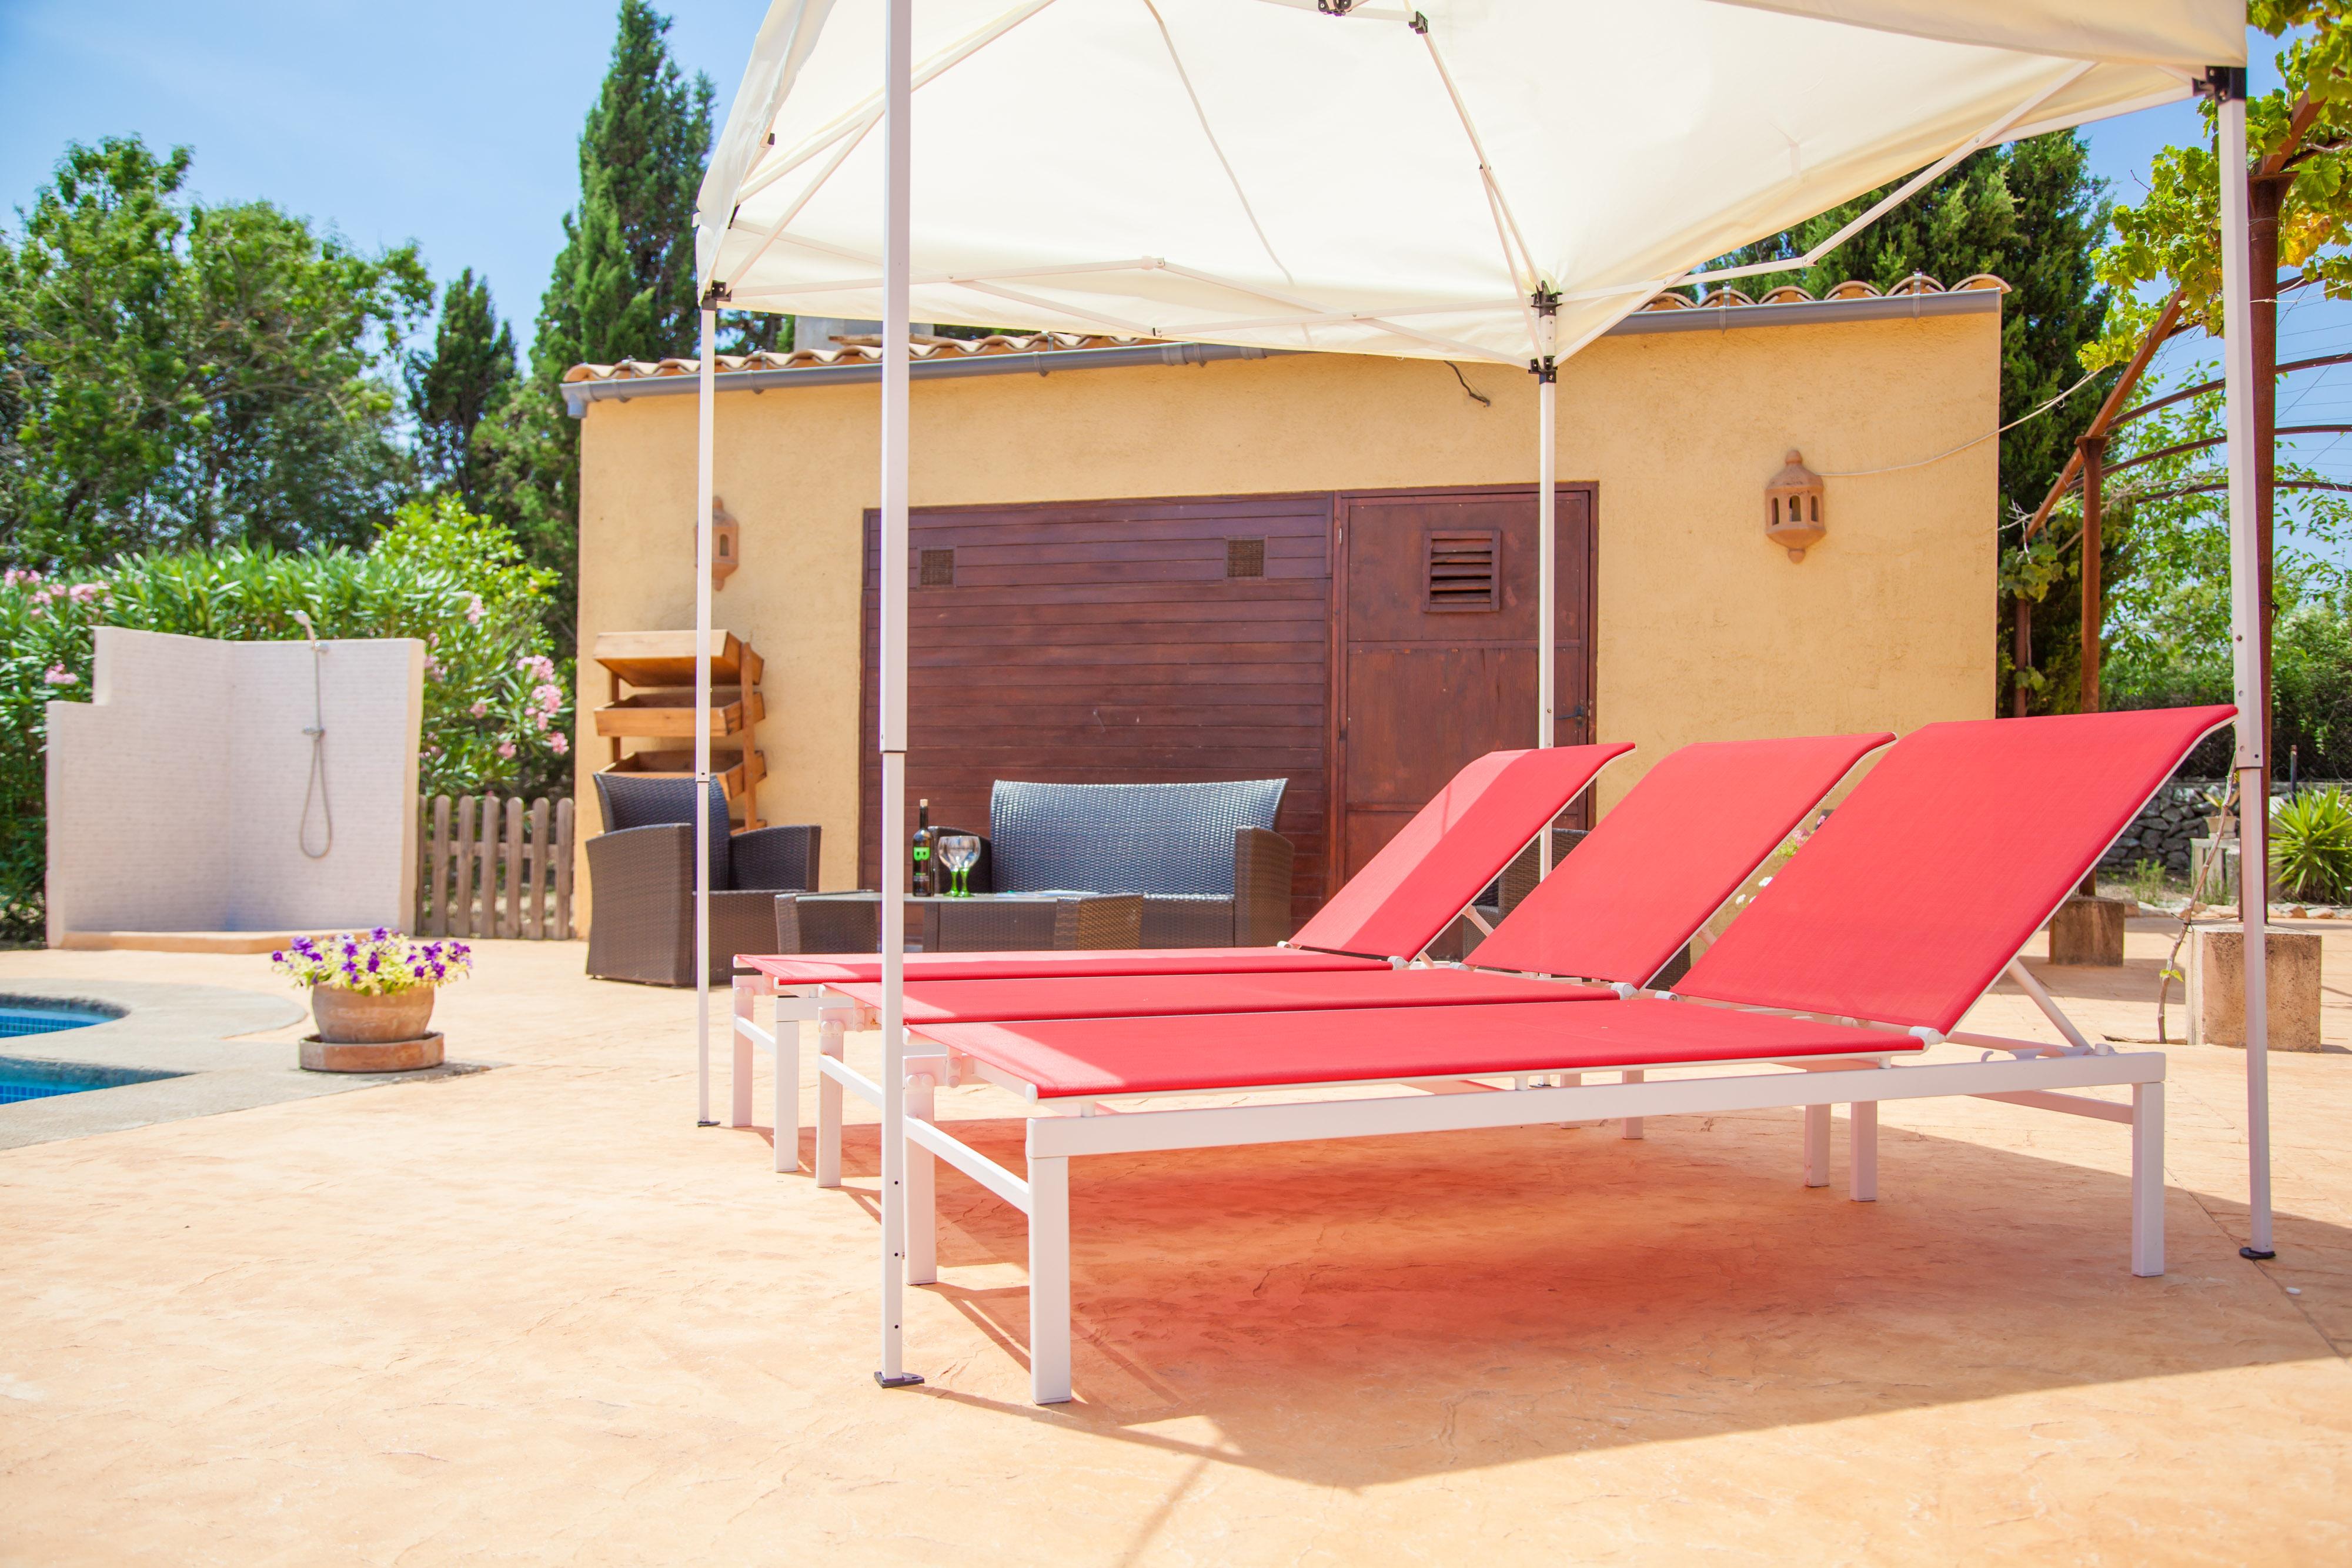 Ferienhaus SA CORBAIA (2020559), Arta, Mallorca, Balearische Inseln, Spanien, Bild 8